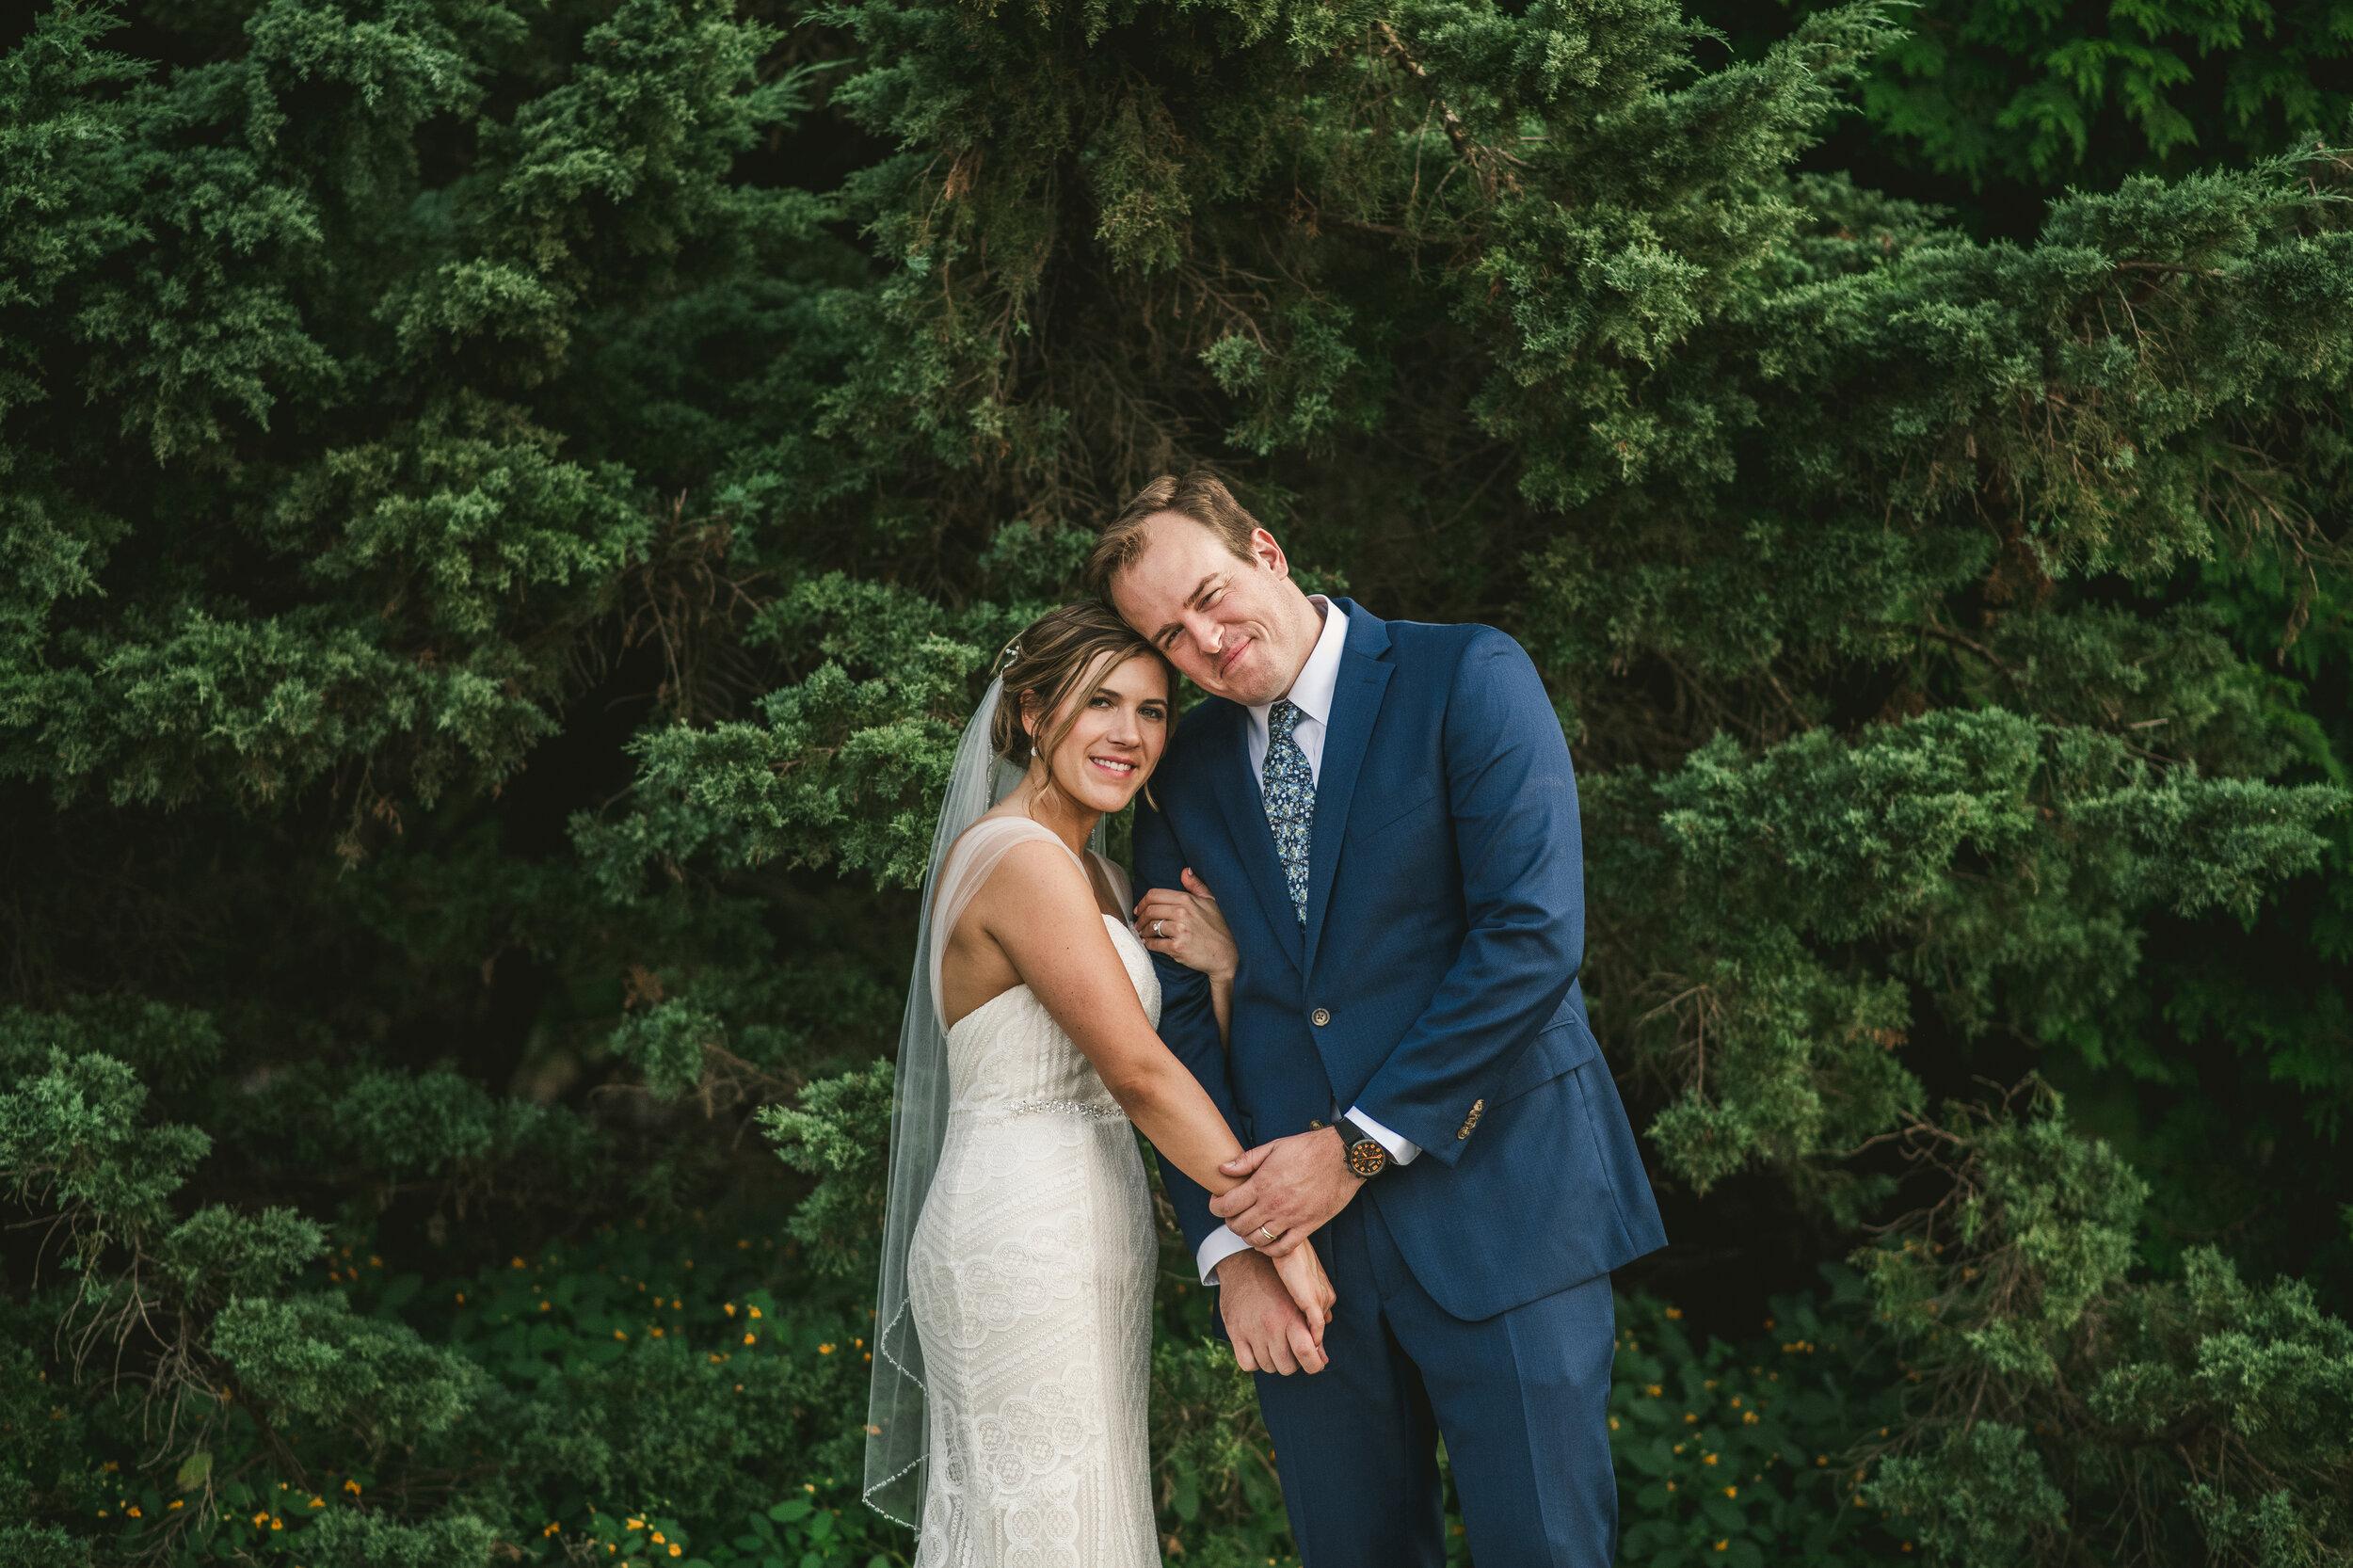 Becca-Cassin-Wedding-Favorites-068-photo.jpg